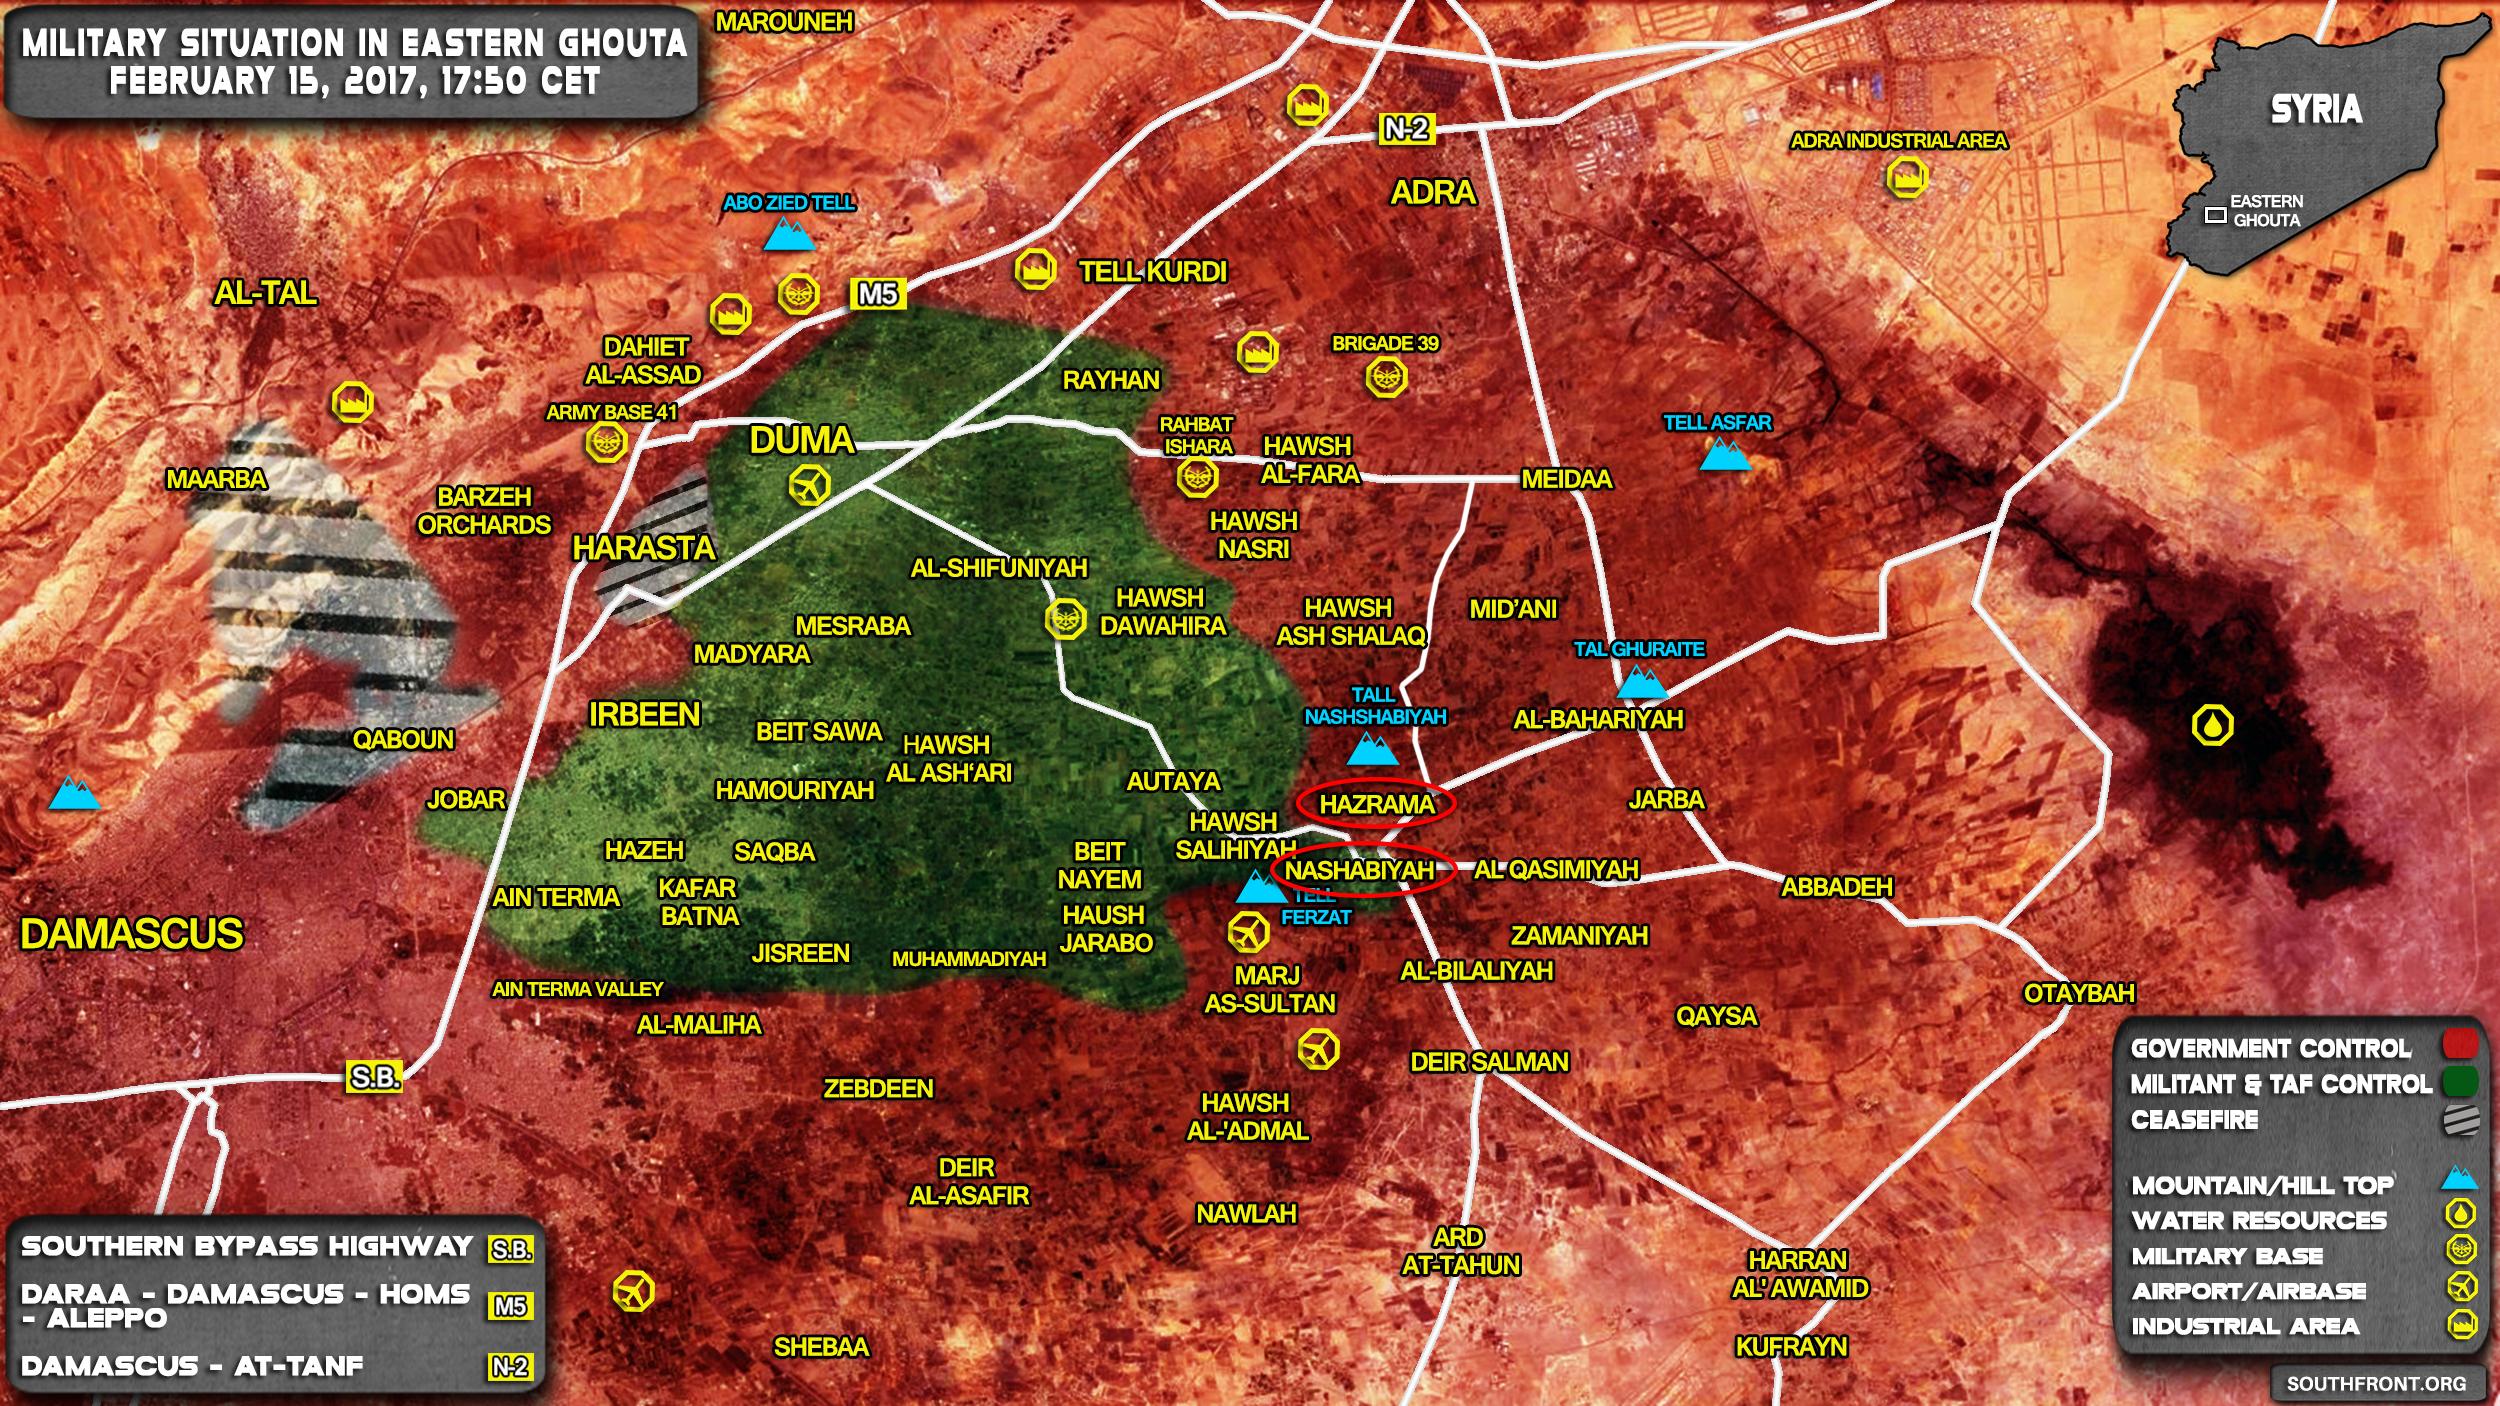 [BIZTPOL] Szíria és Irak - 3. - Page 37 15feb_eastern_ghouta_Syria_War_Map